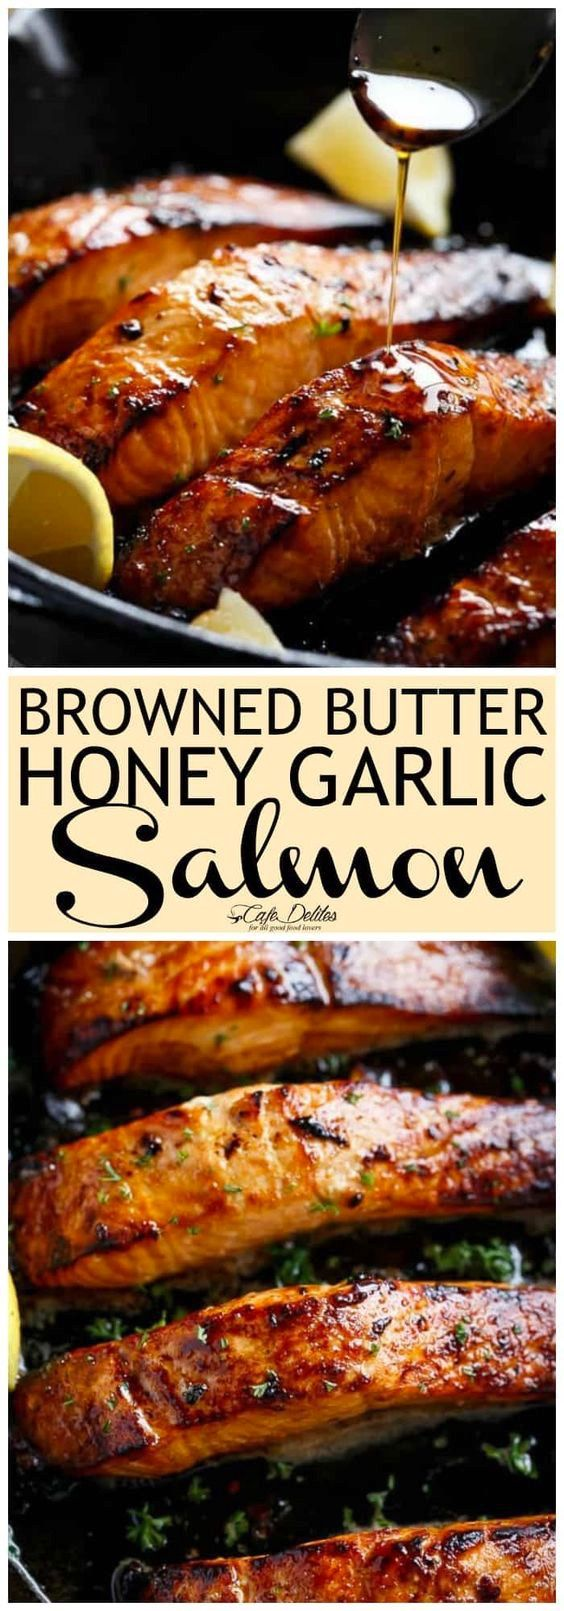 Photo of Browned Butter Honey Garlic Salmon Recipe